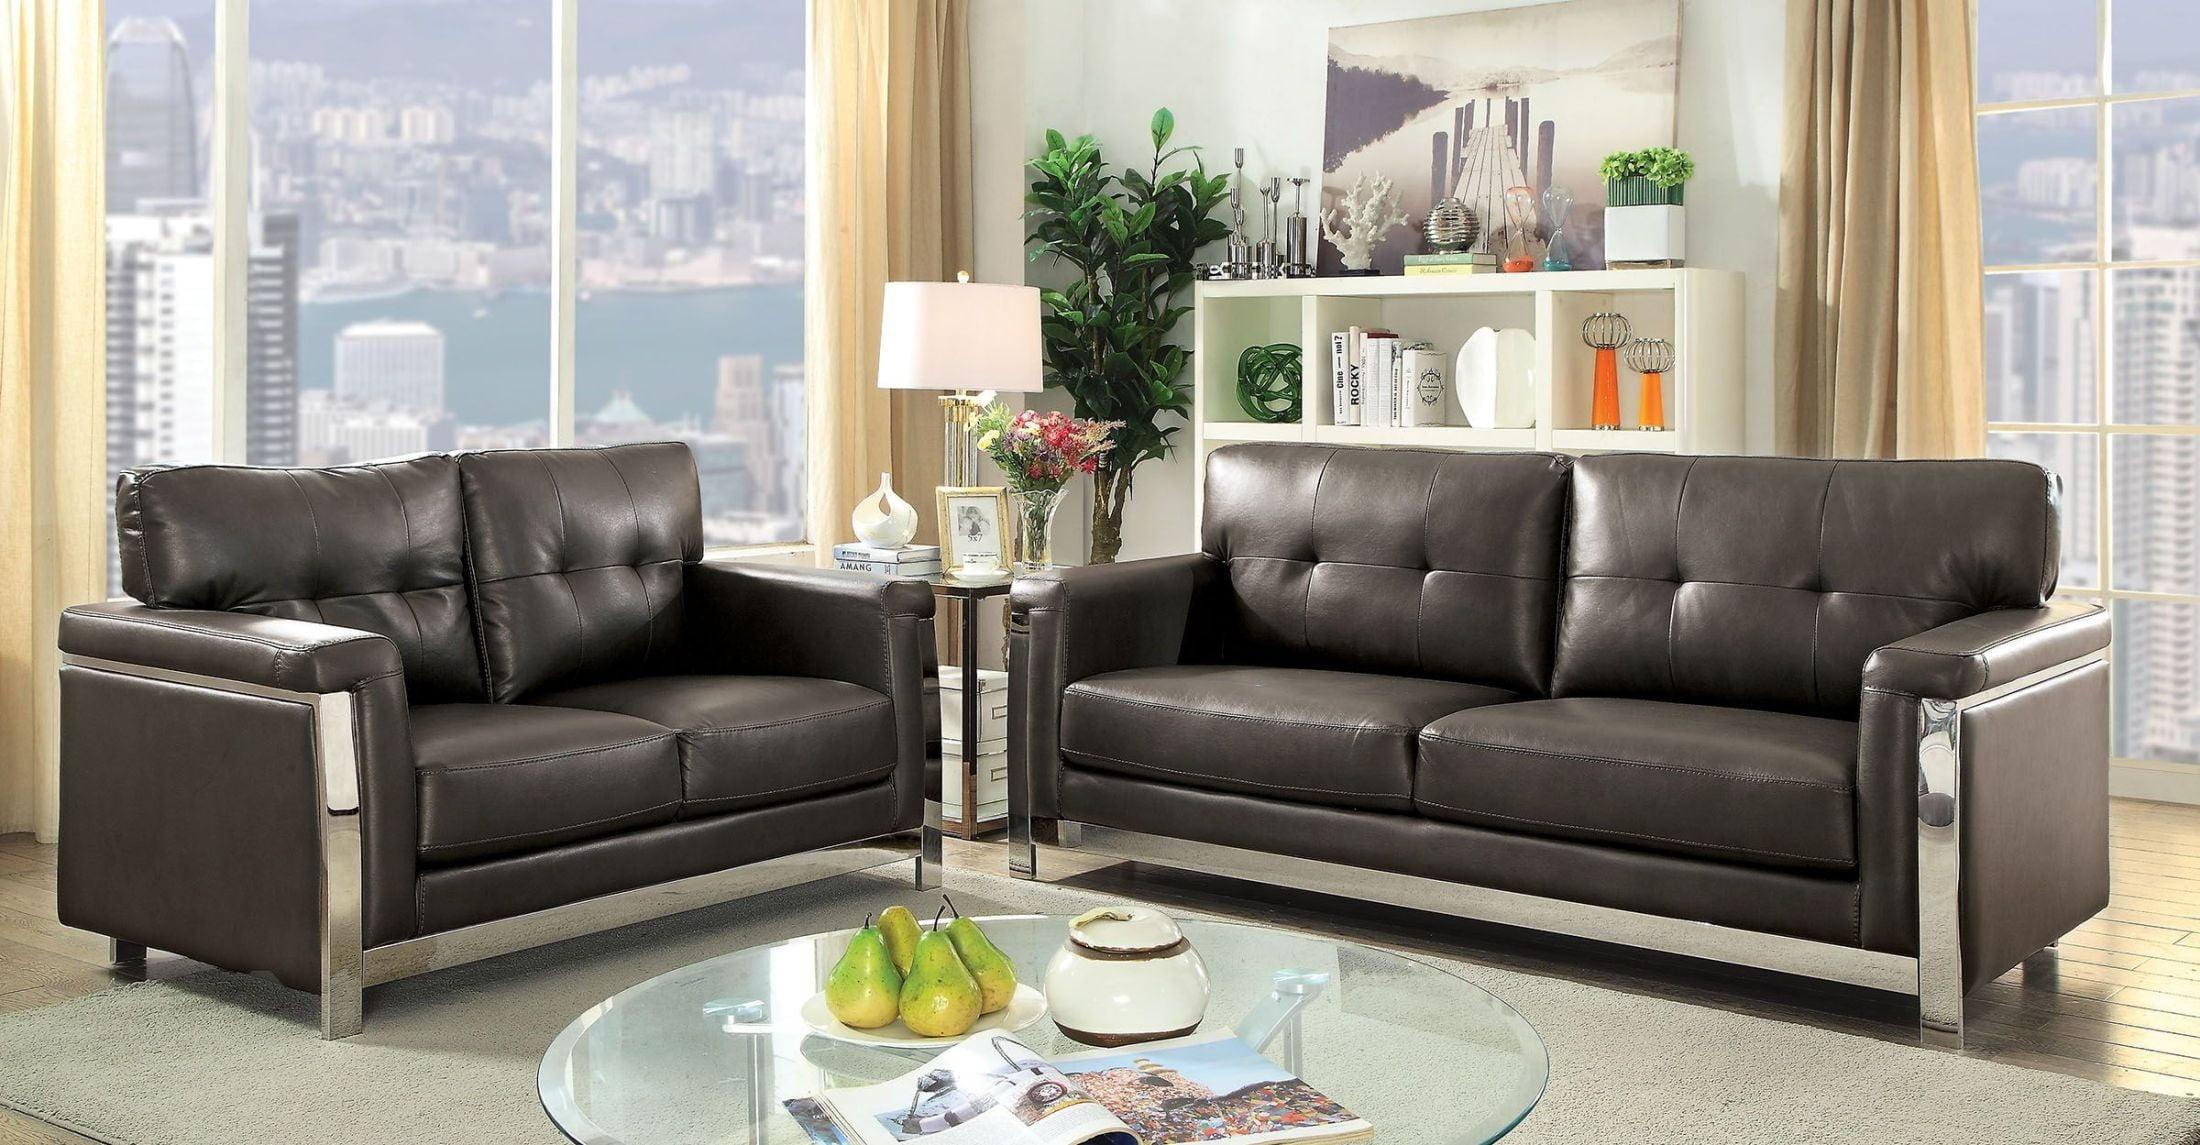 Nanette Gray Living Room Set From Furniture Of America